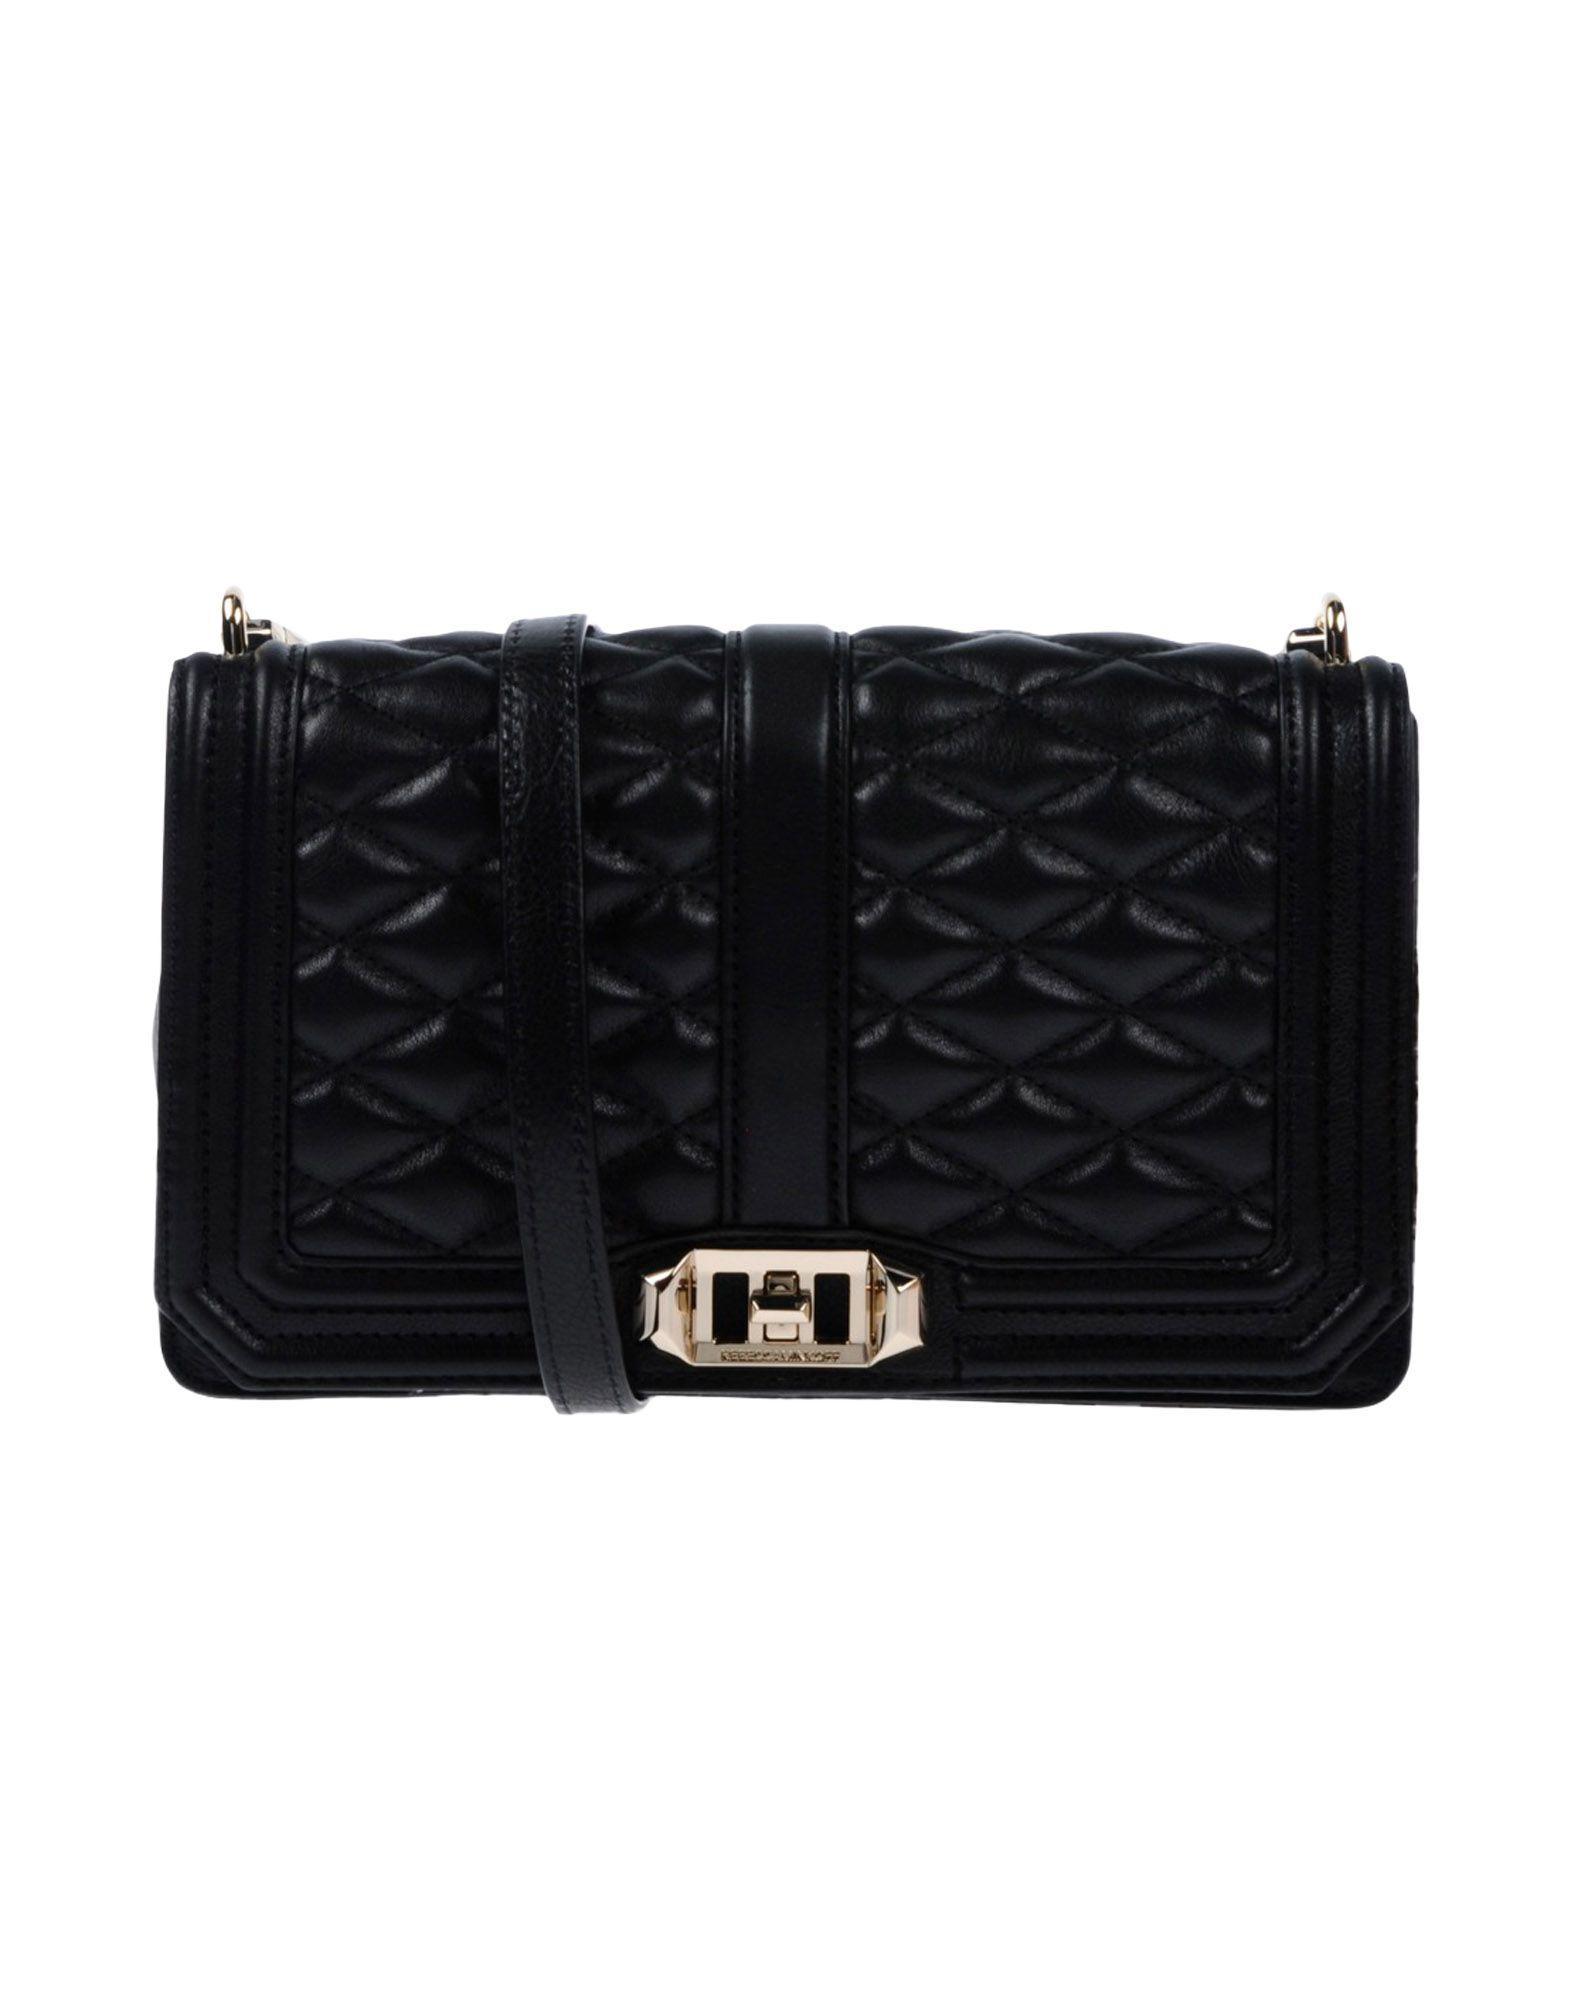 Rebecca Minkoff Handbags In Black